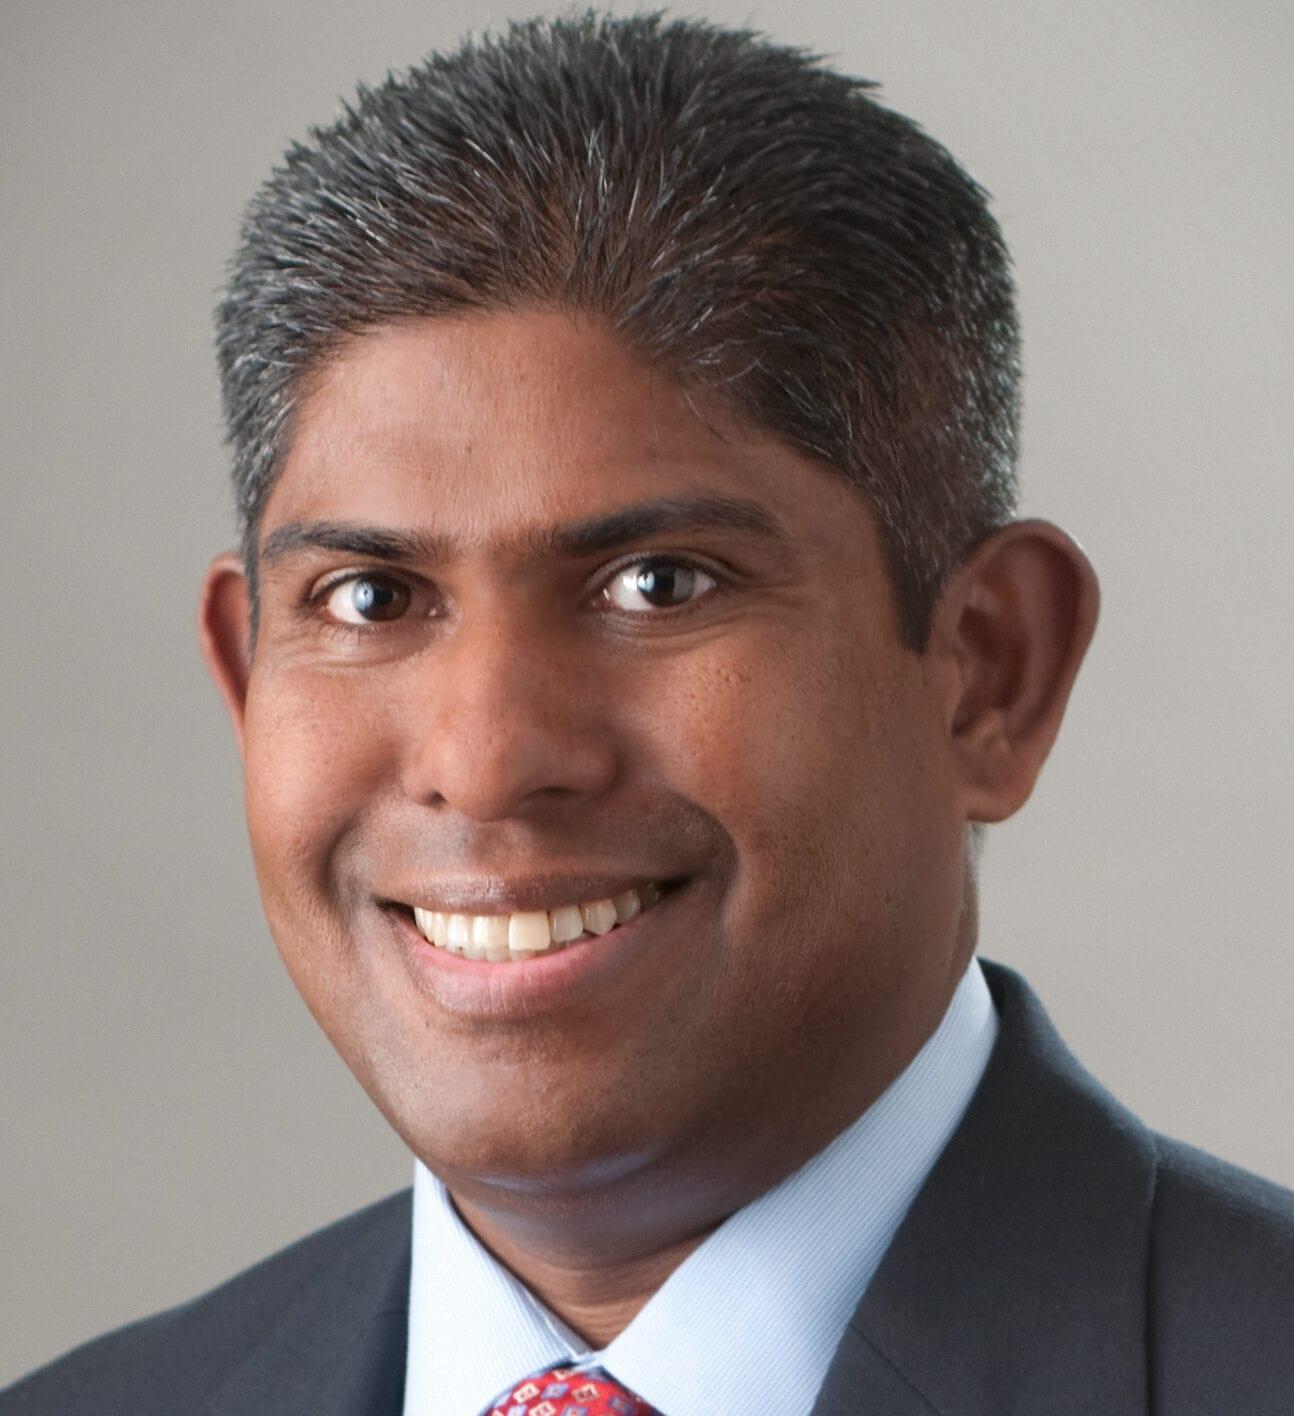 Pathmal Gunawardana, Head of Americas, Tata Communications